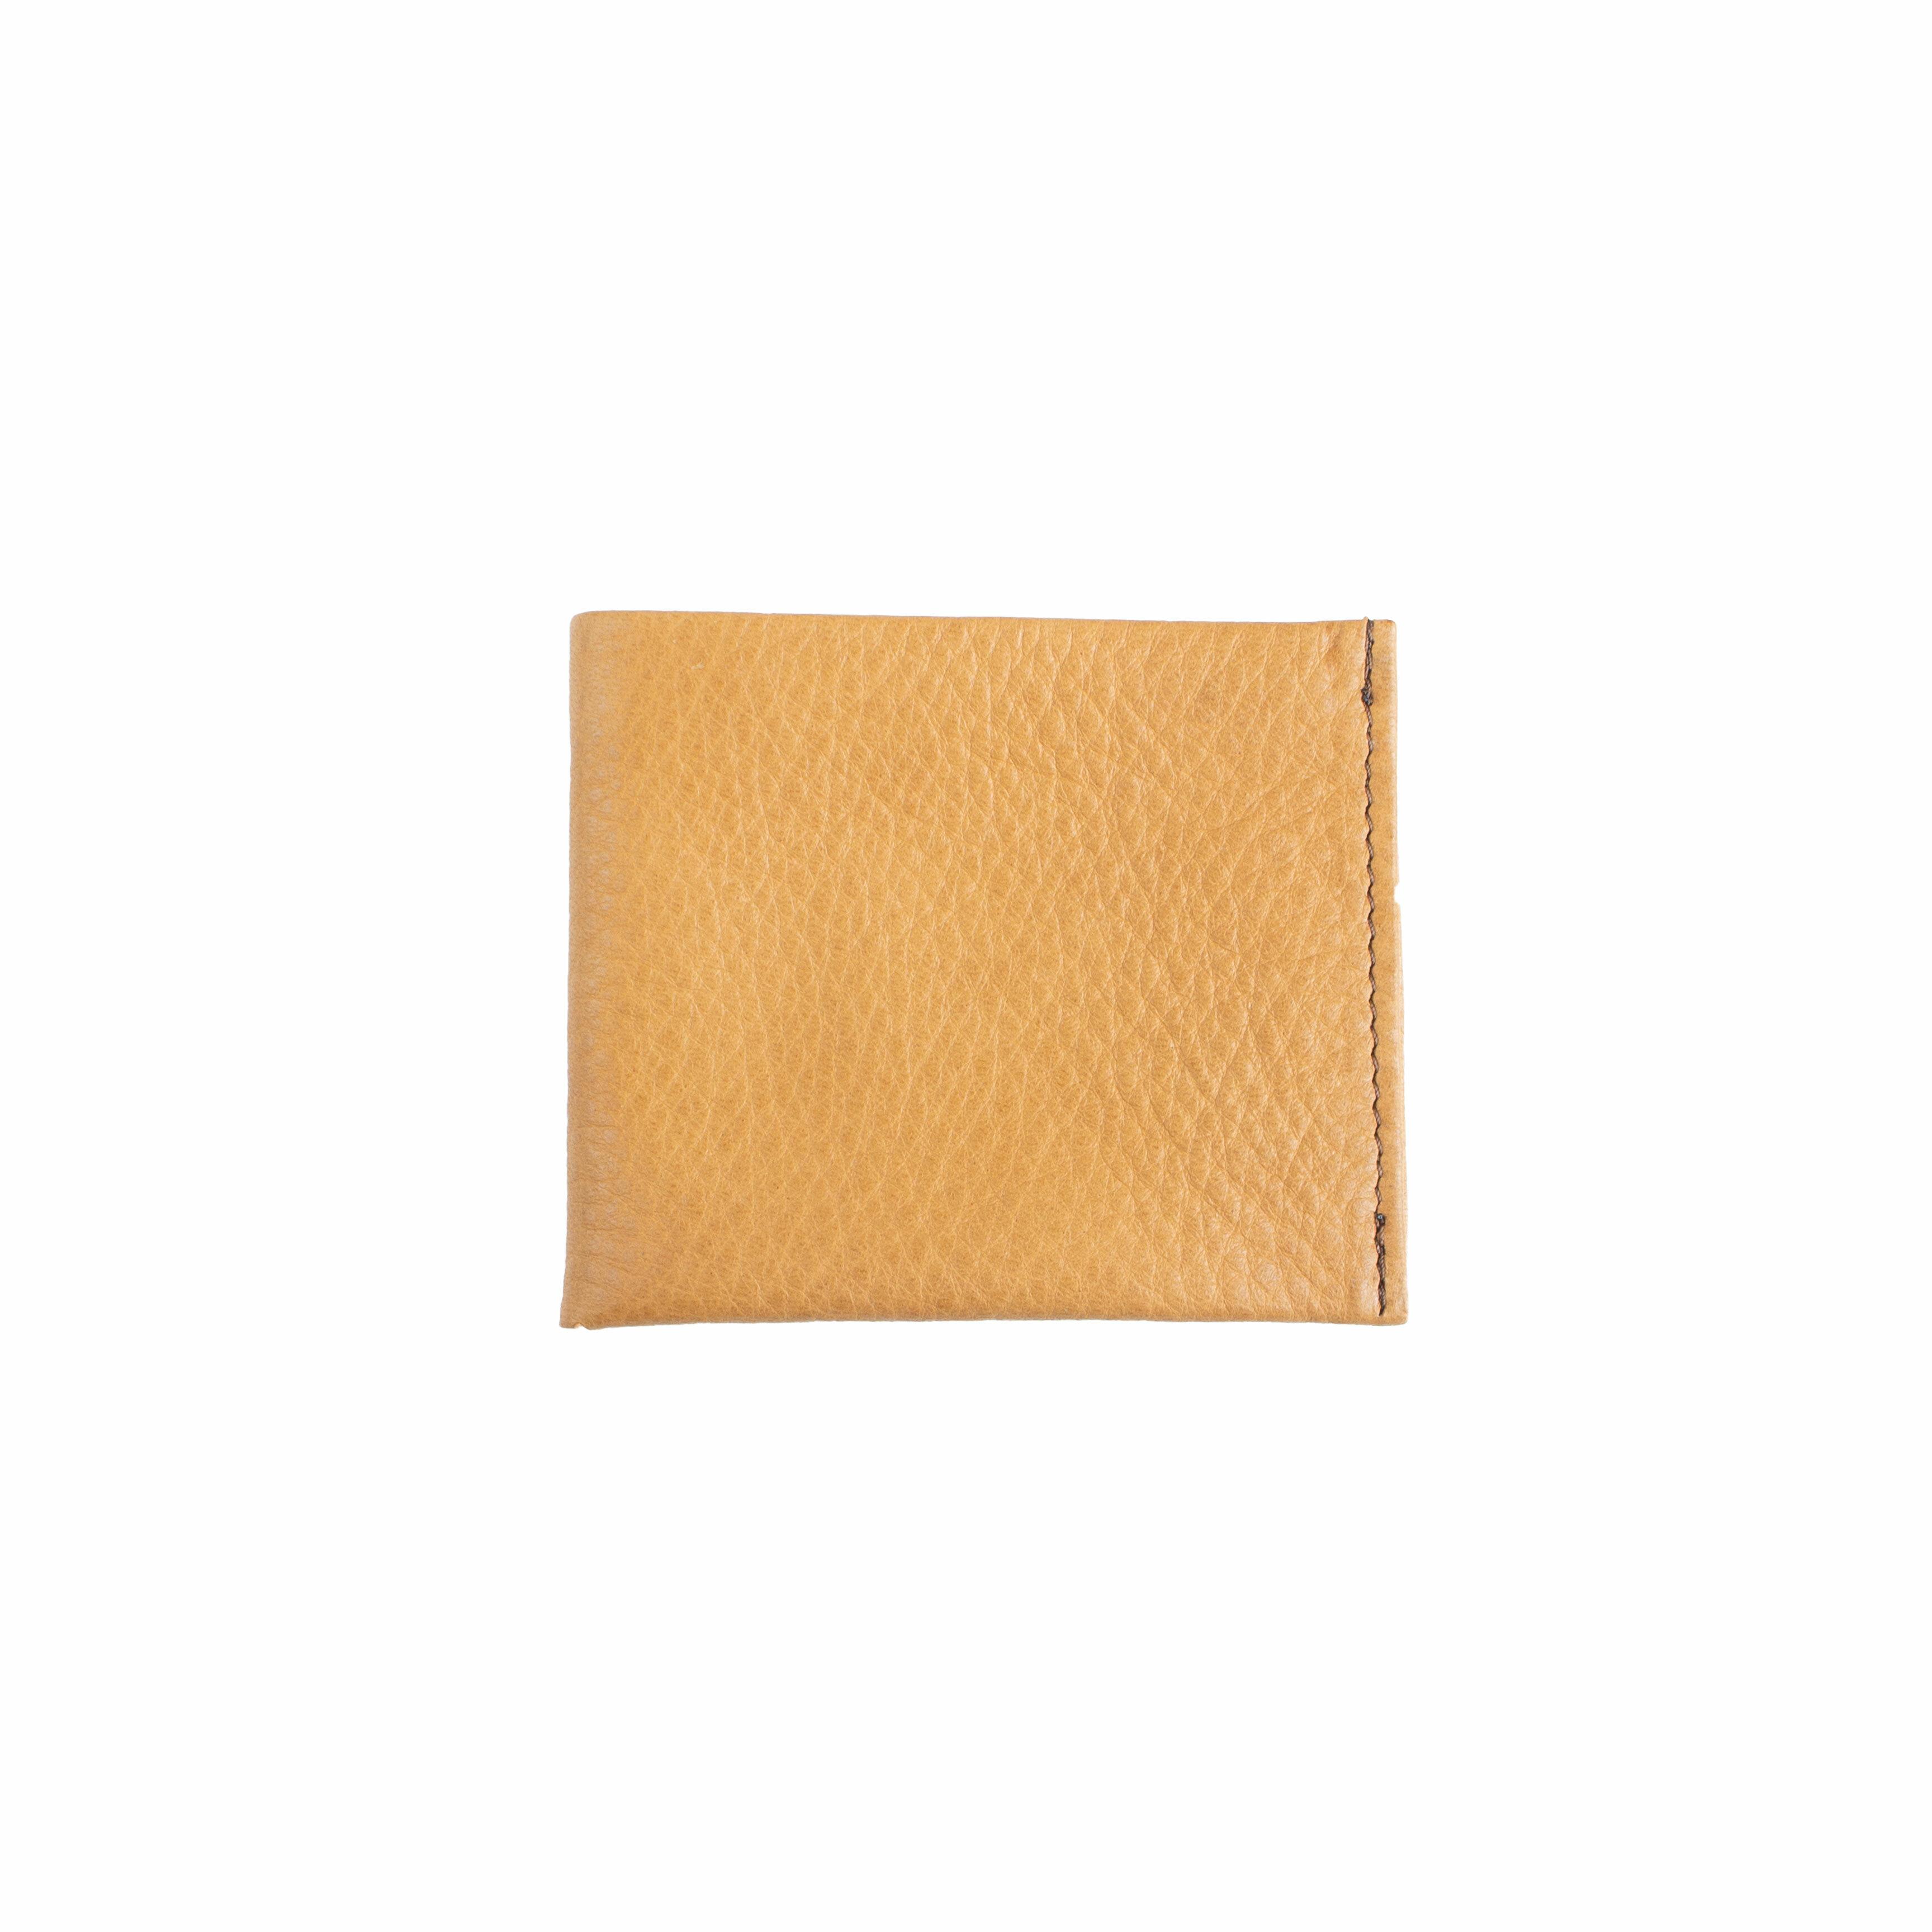 オリガミ財布[蝦夷鹿革]